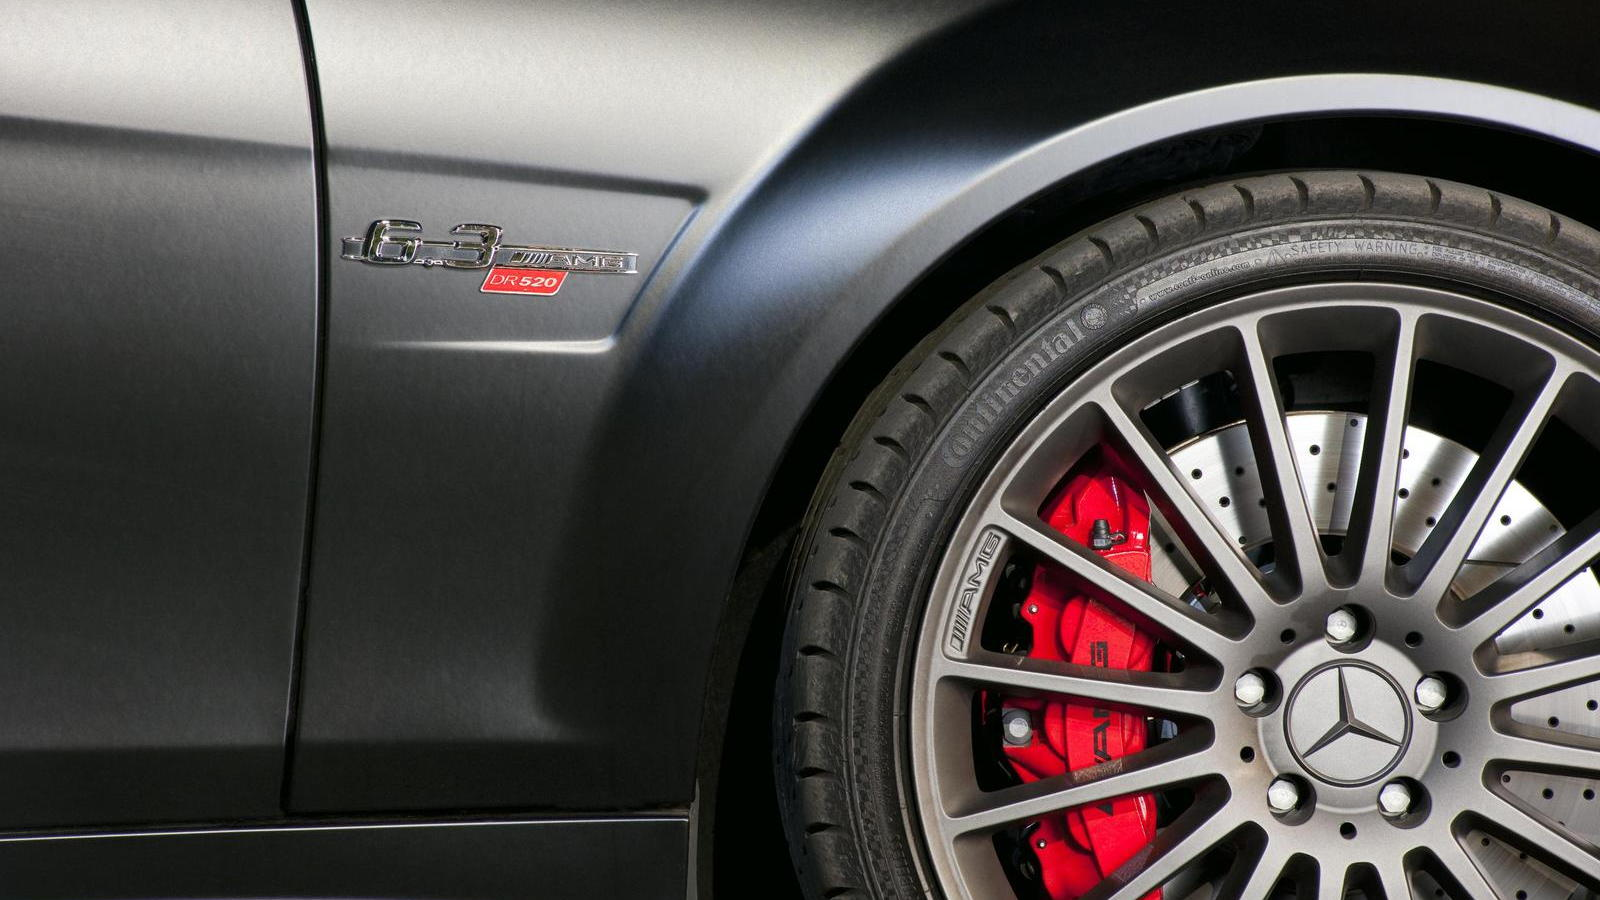 Mercedes-Benz C63 AMG DR 520